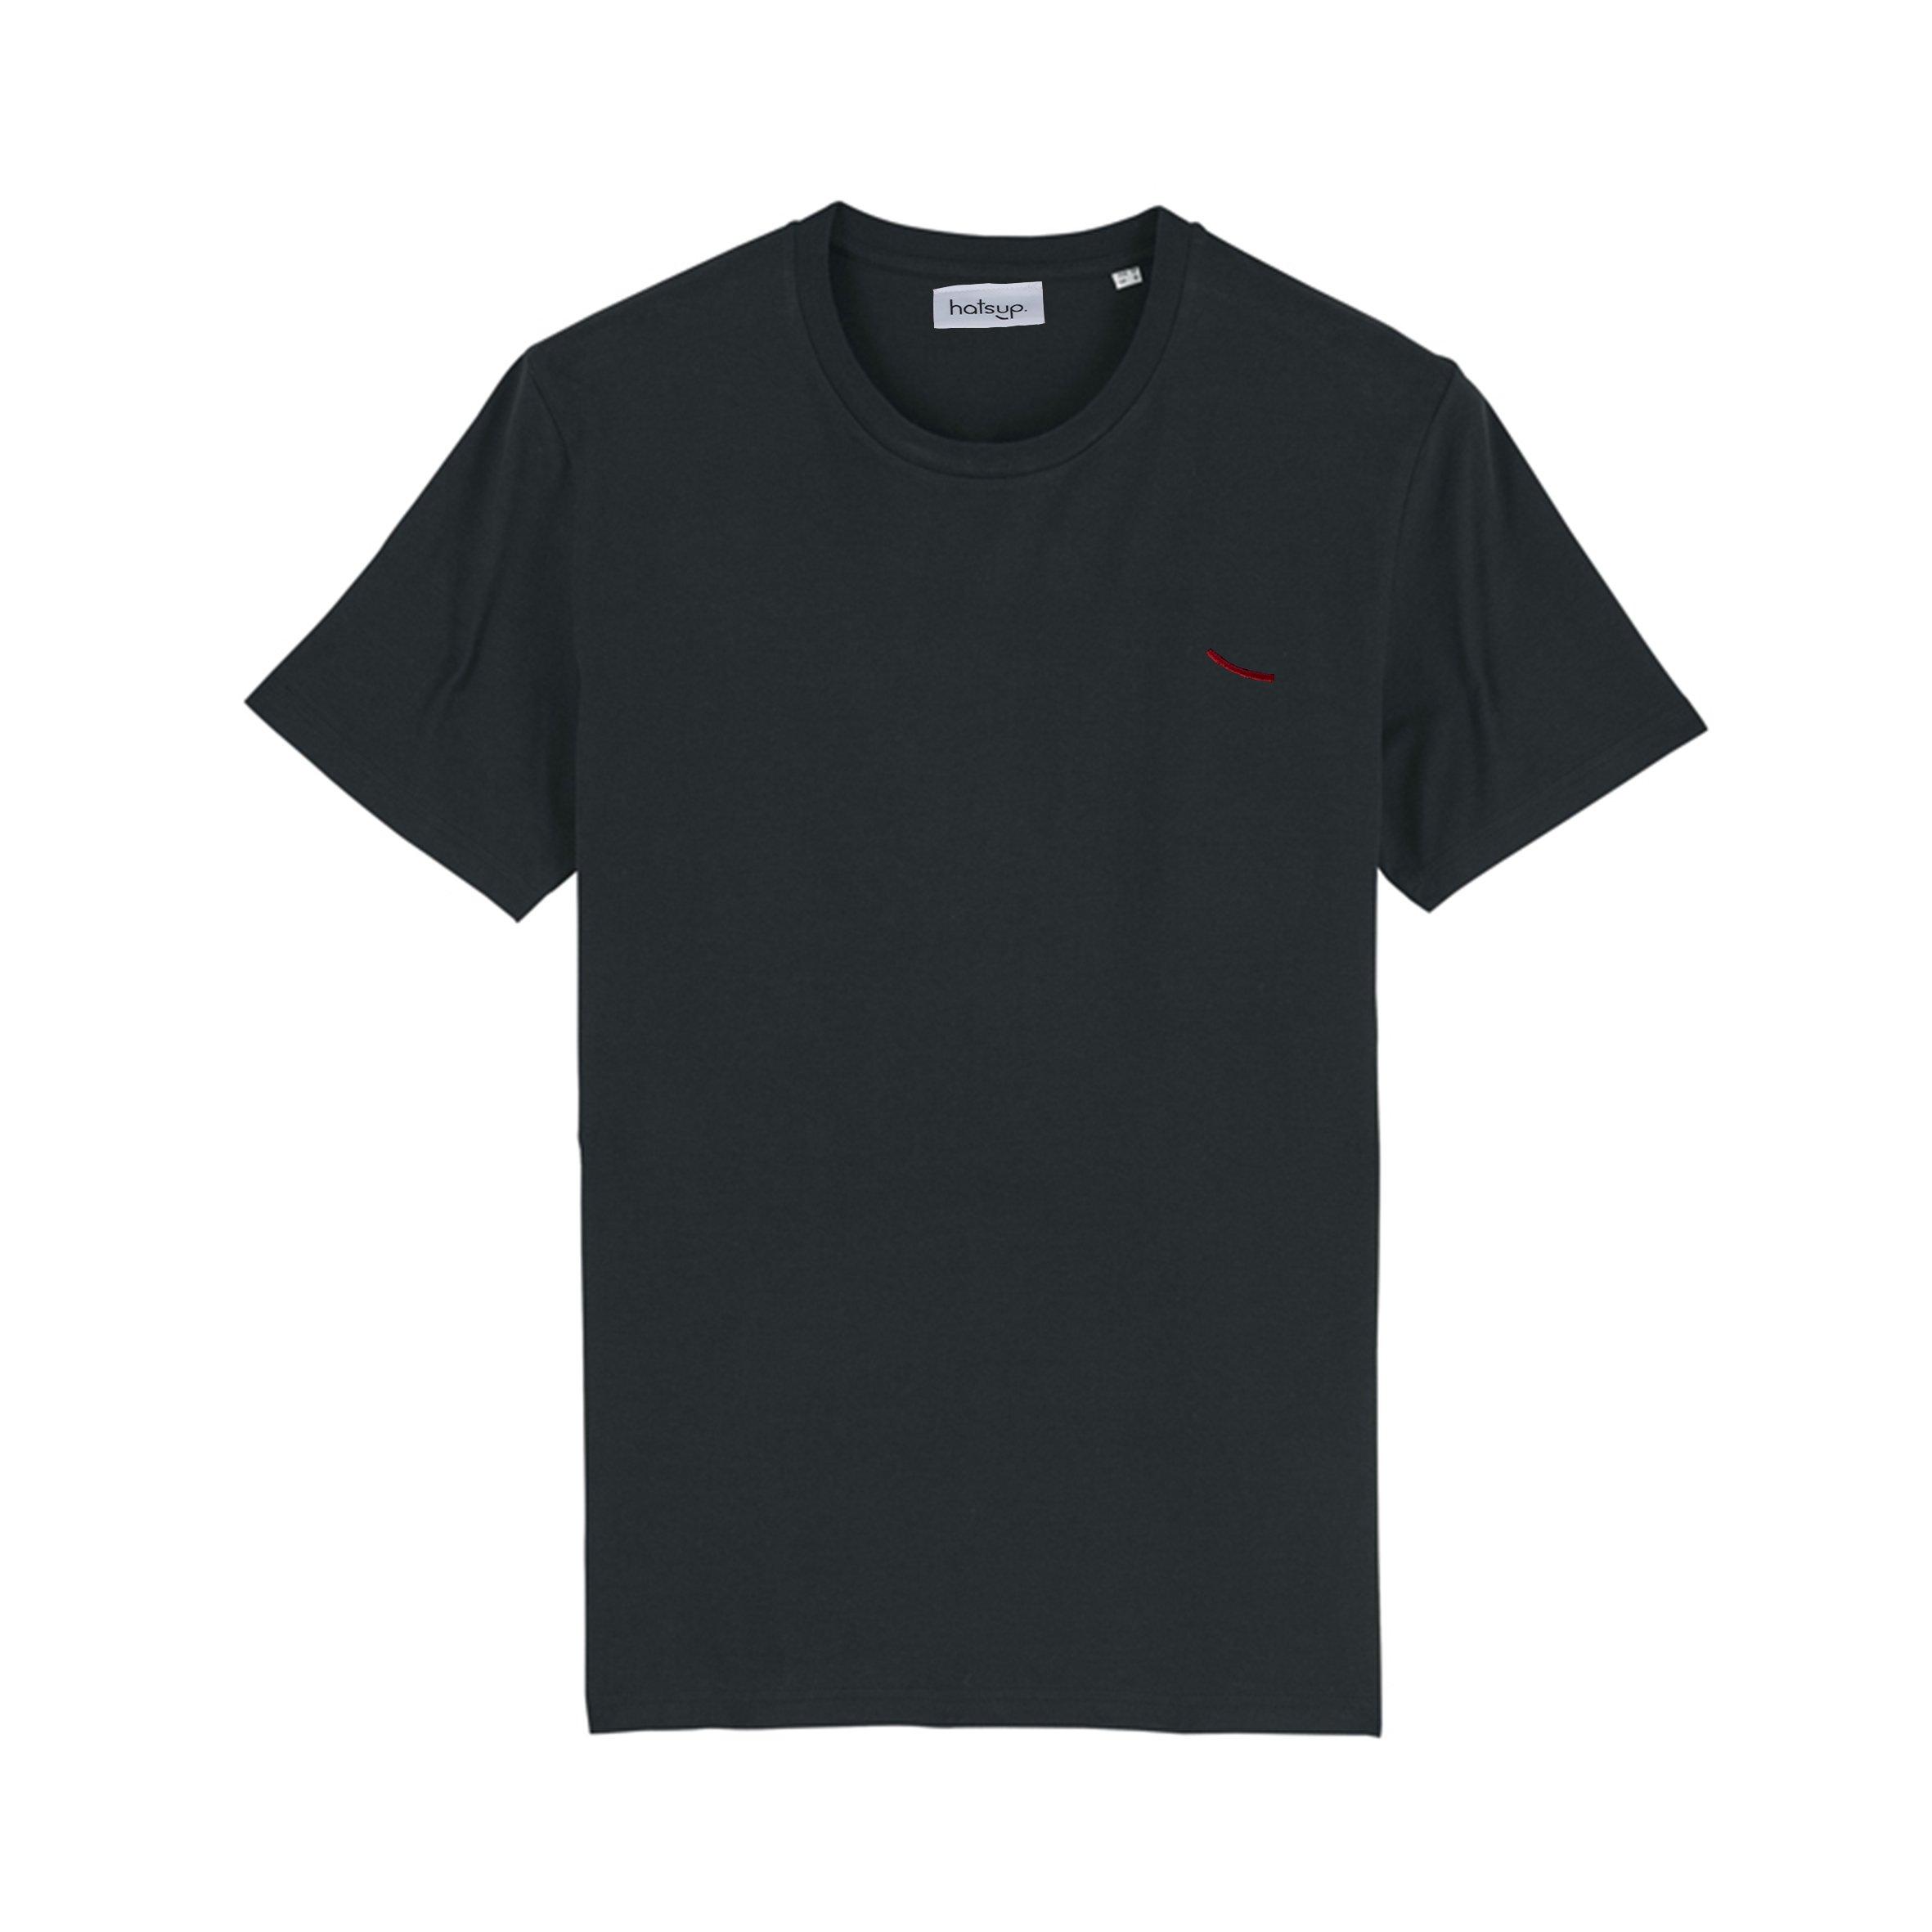 T-shirt Douala black from hatsup